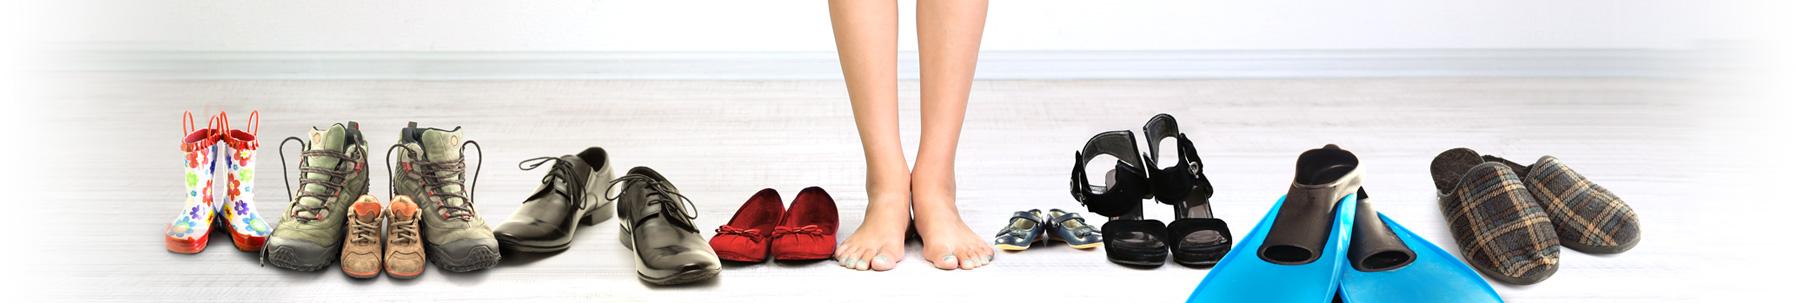 cabecera zapatos